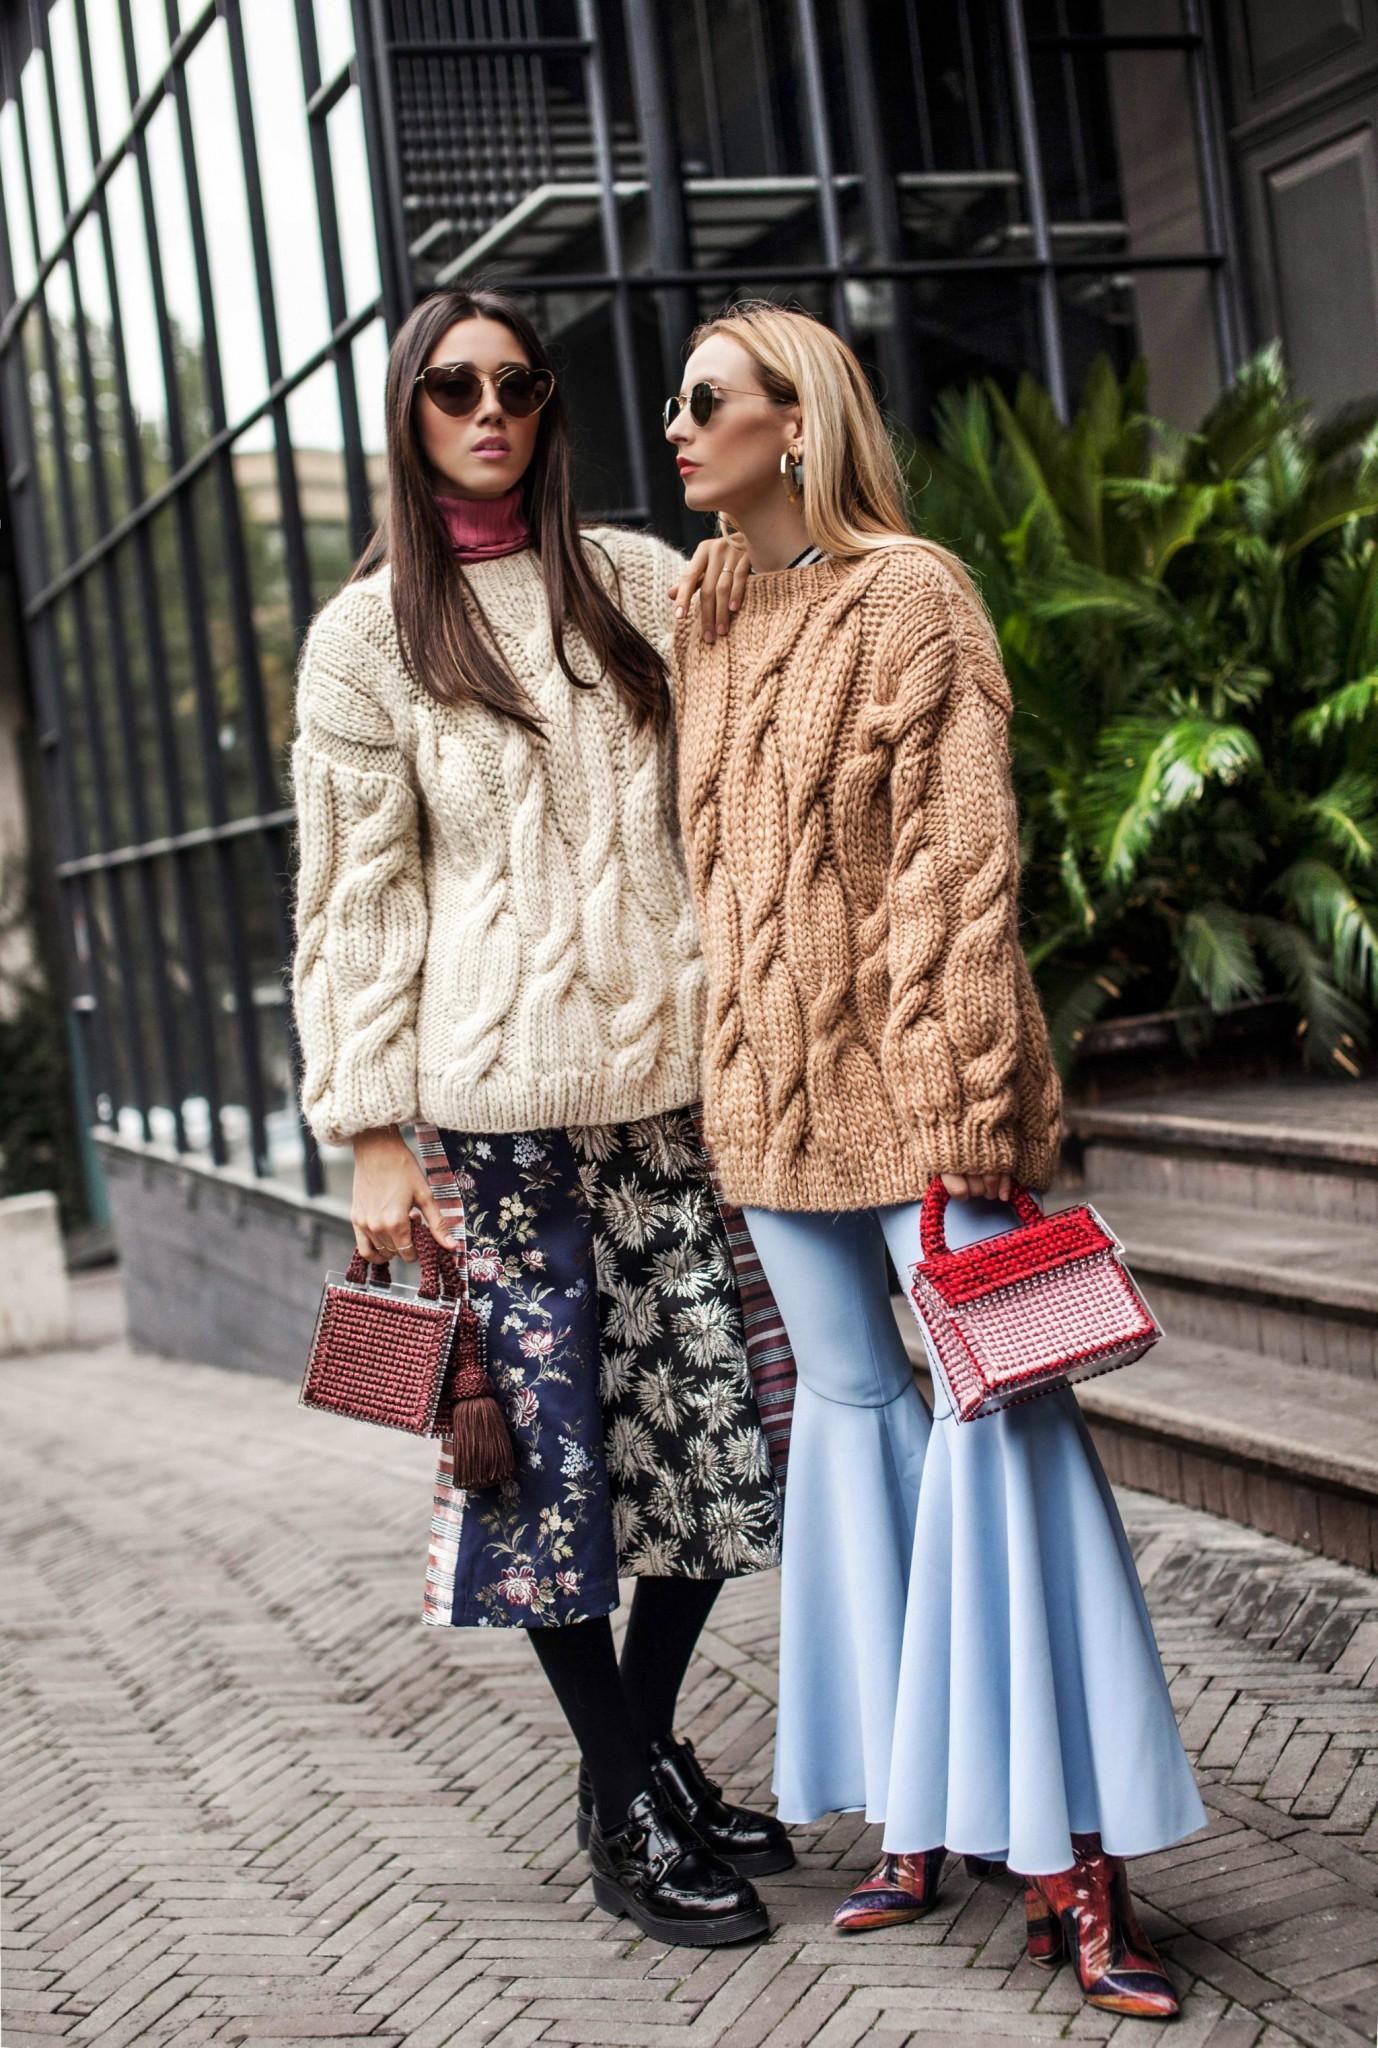 7tbilisi_fashionweek_fabulous_muses_diana_Enciu_Alina_tanasa